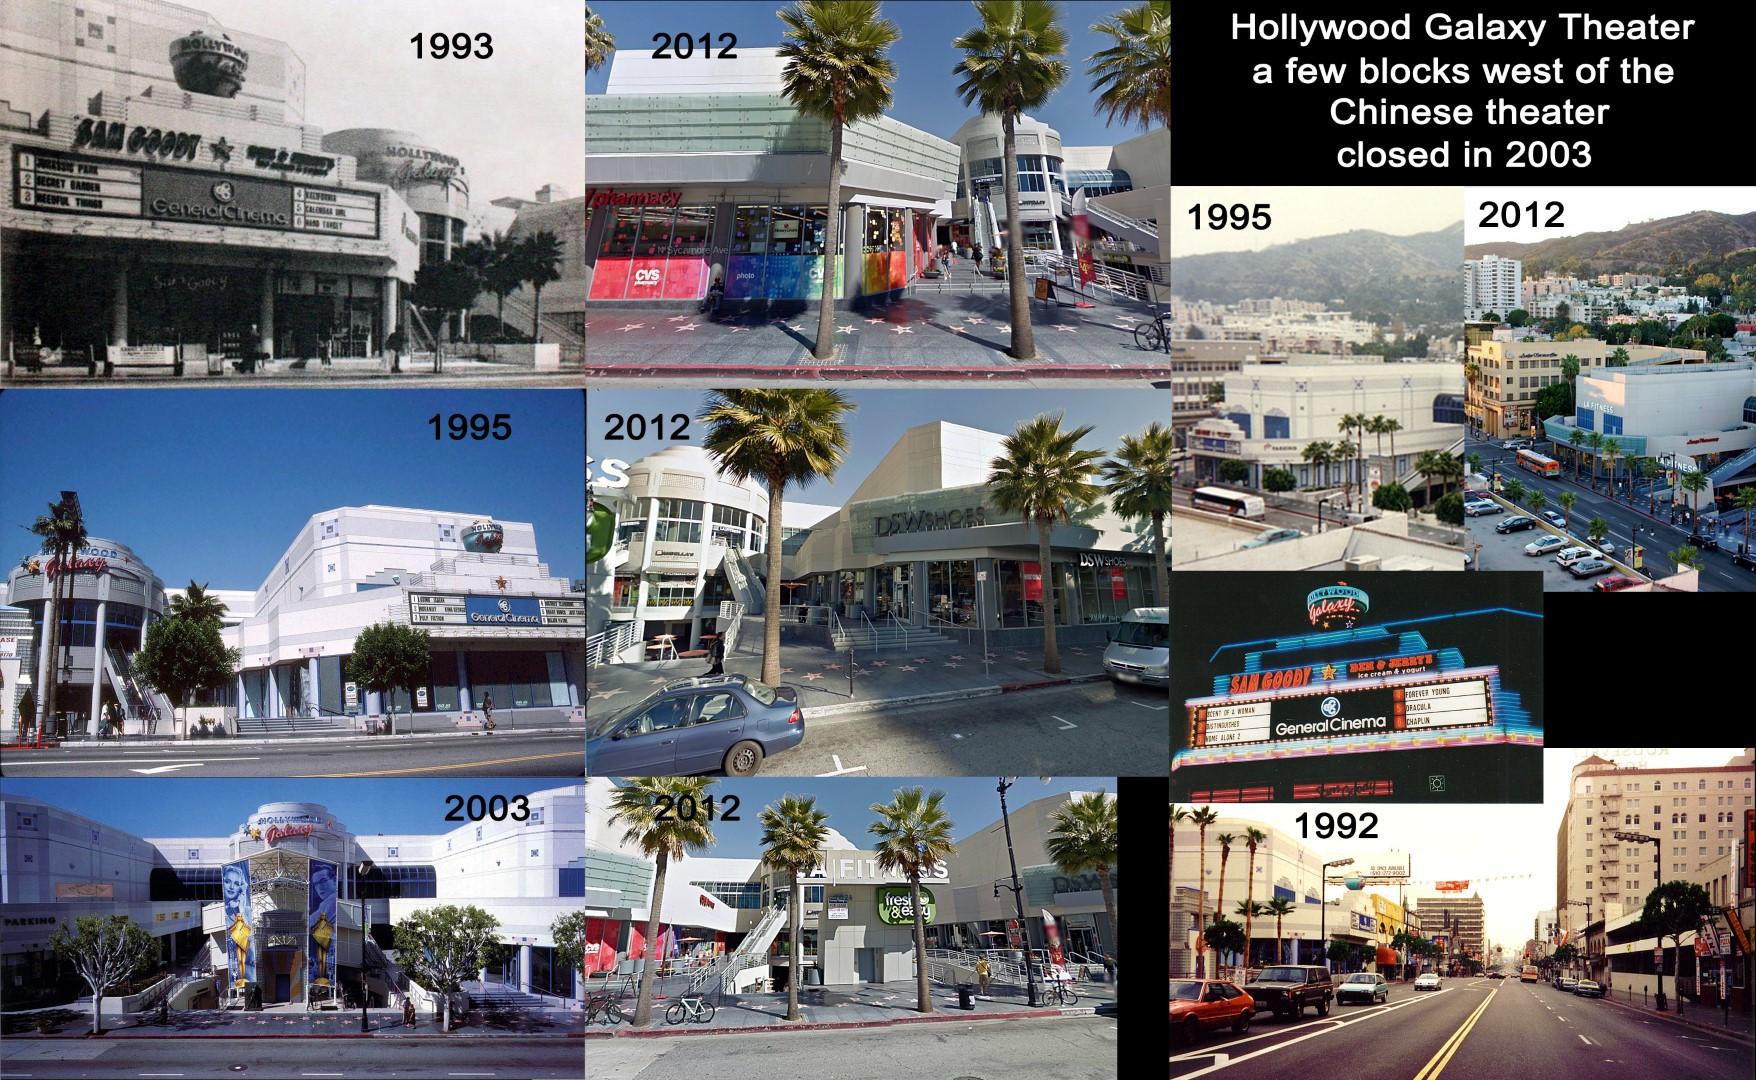 Hollywood galaxy Theater 1993 - 2012